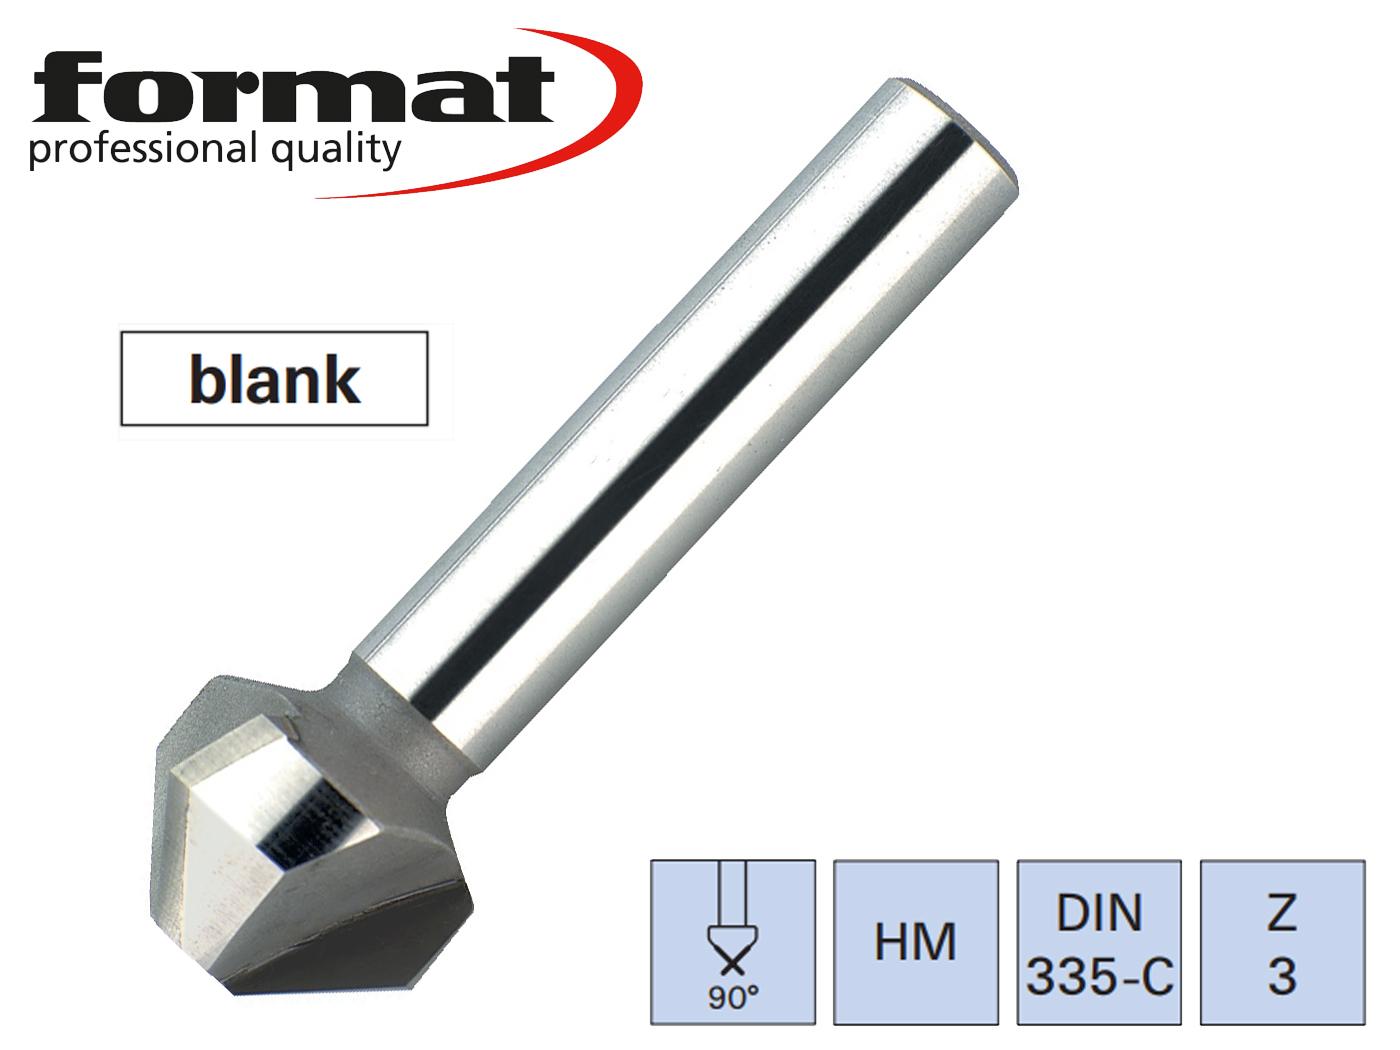 verzinkboor DIN 335C VHM 90G FORMAT | DKMTools - DKM Tools